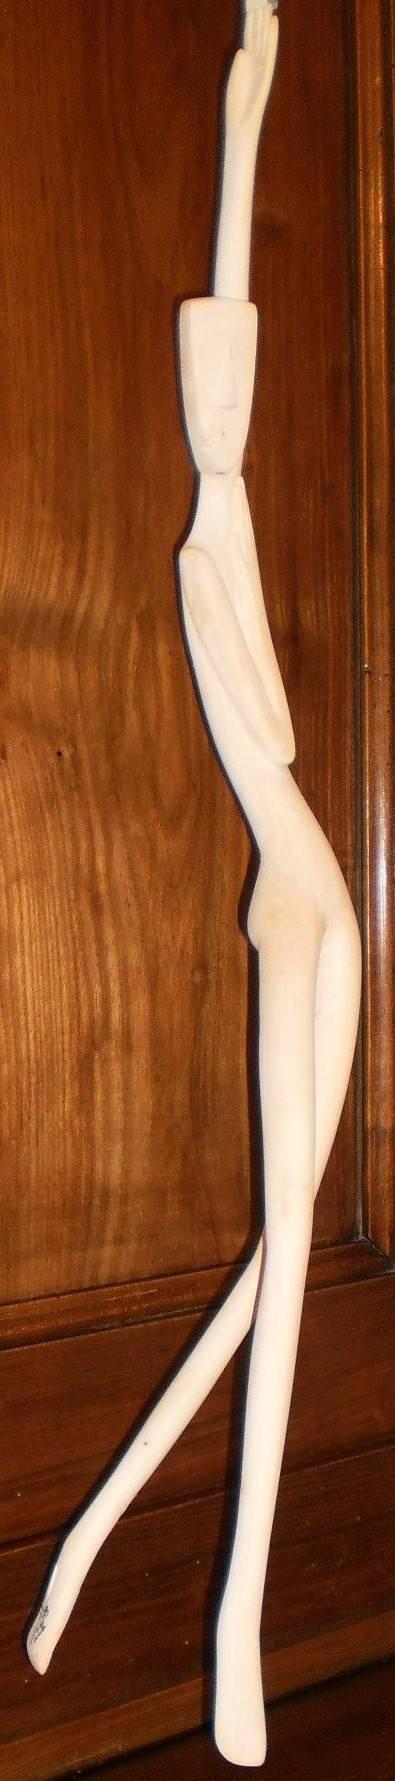 La danse alisier blanc 60 cm